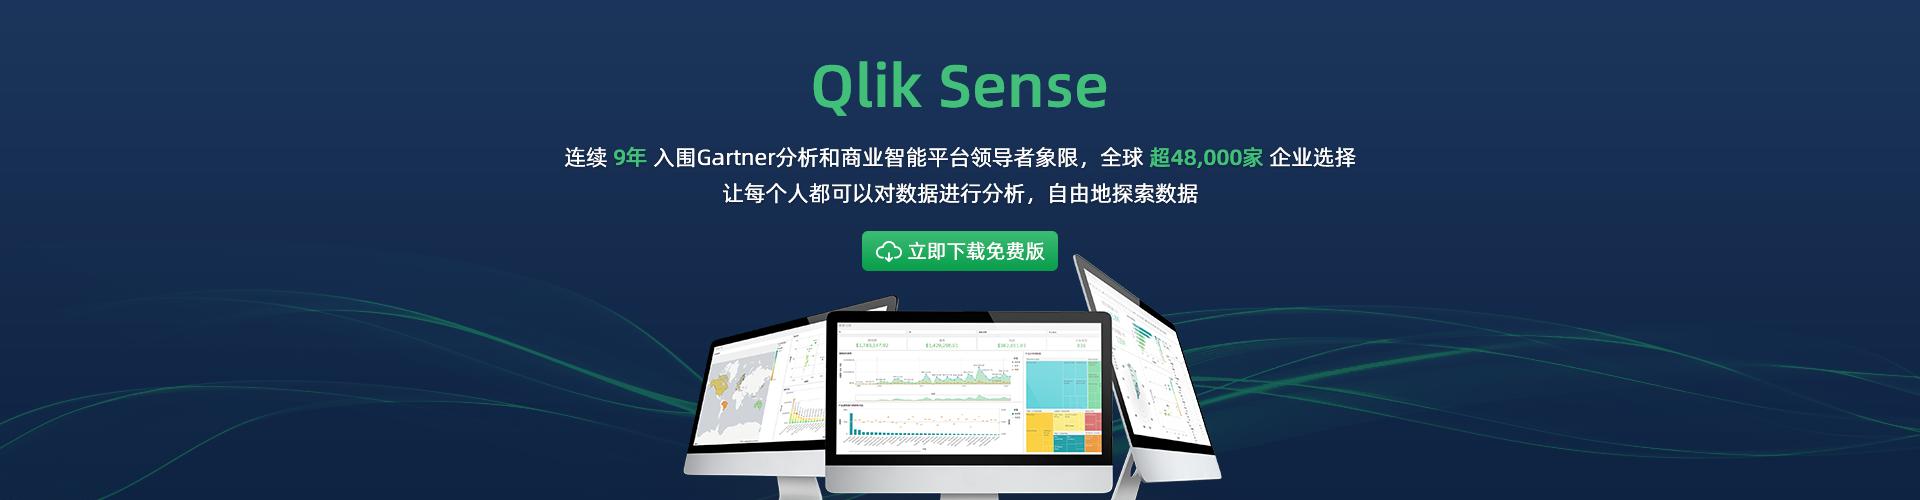 qlik sense广告宣传